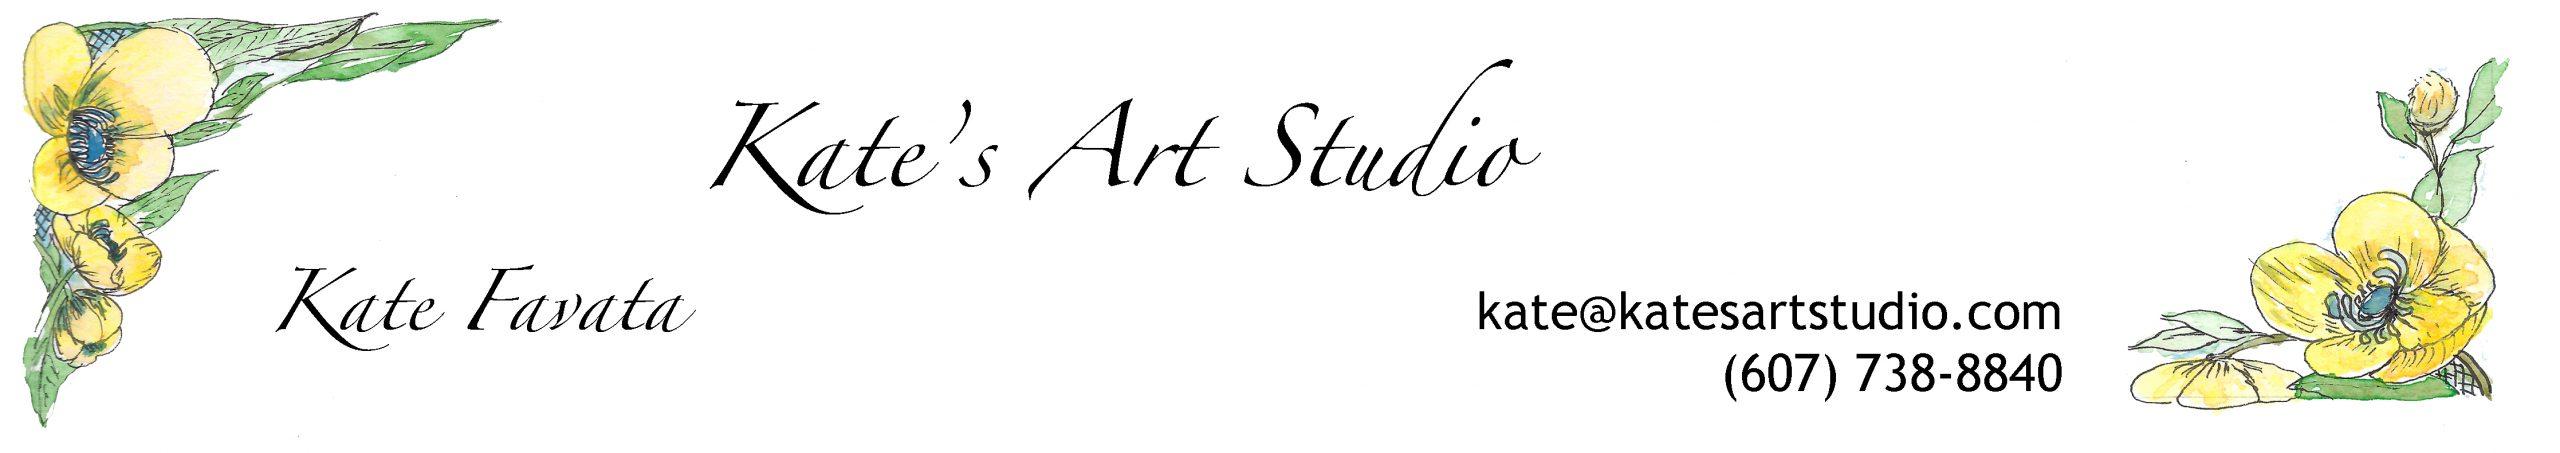 Kate's Art Studio